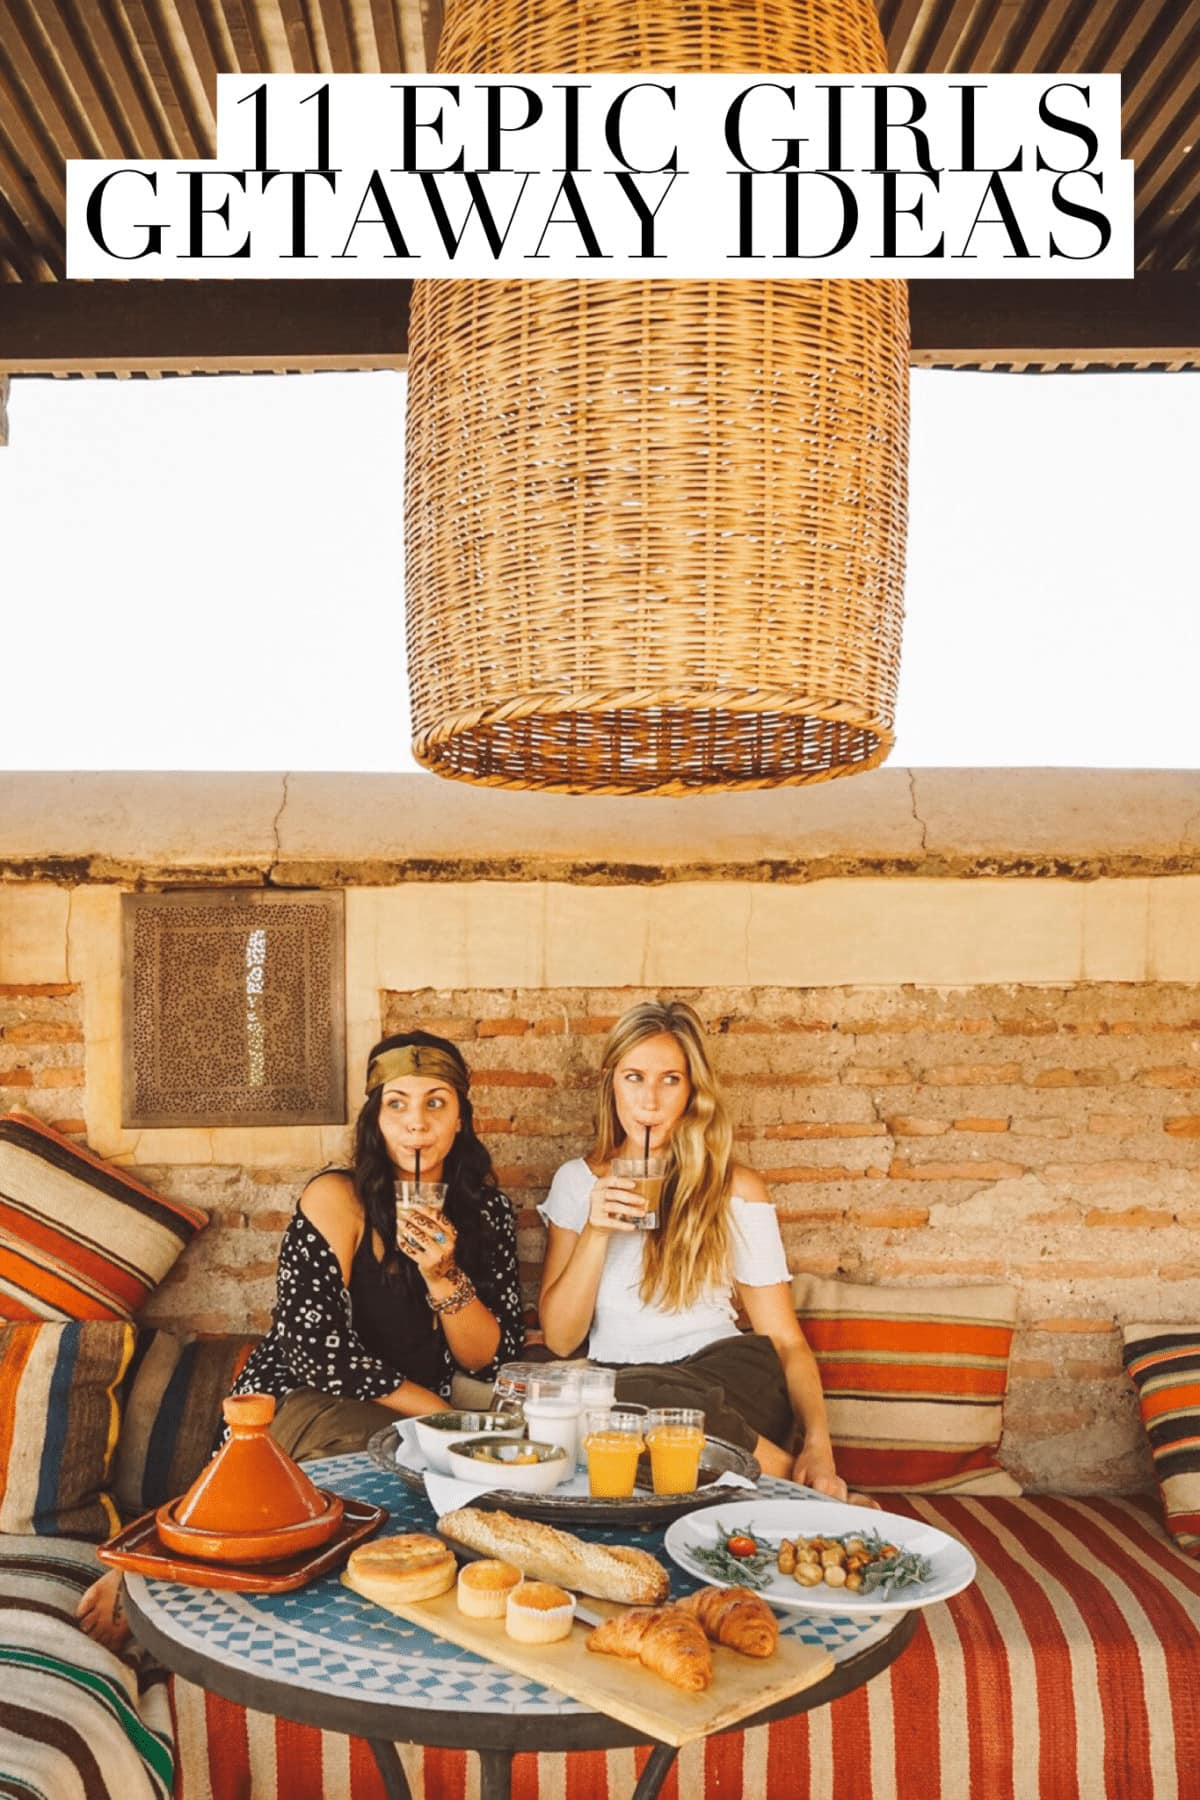 11 Epic Girls Getaway Ideas to Start Planning Now